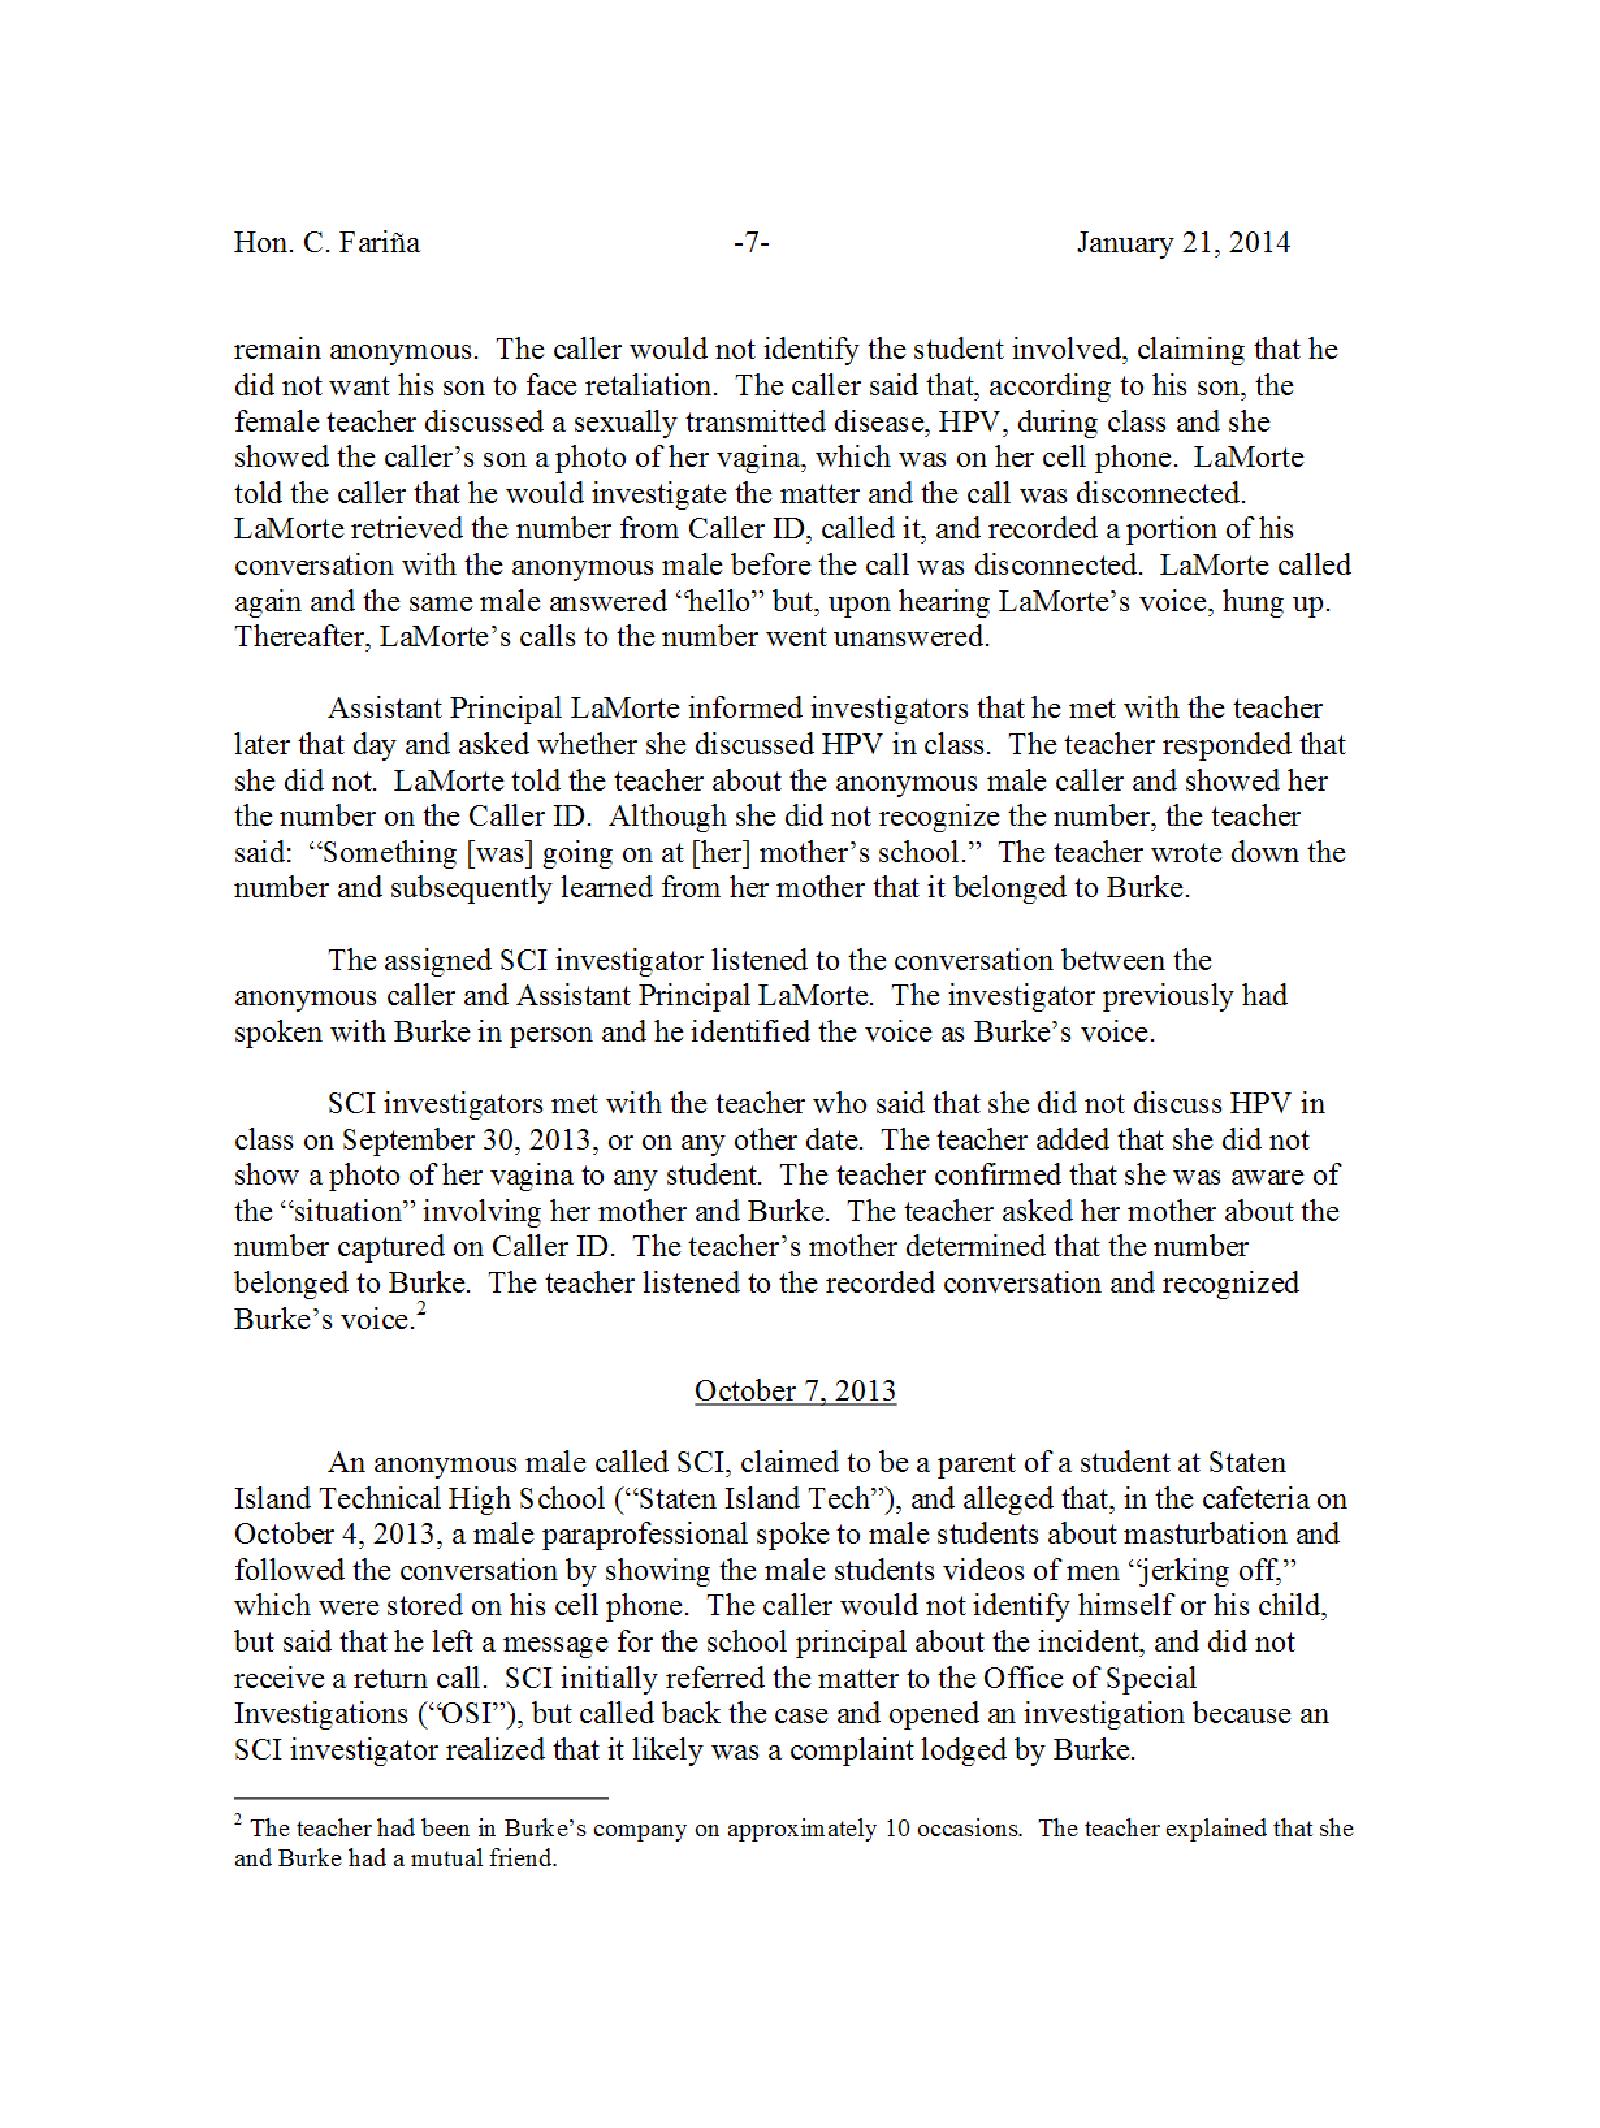 Copy of 1-22-2014 9-25-02 AM07.png